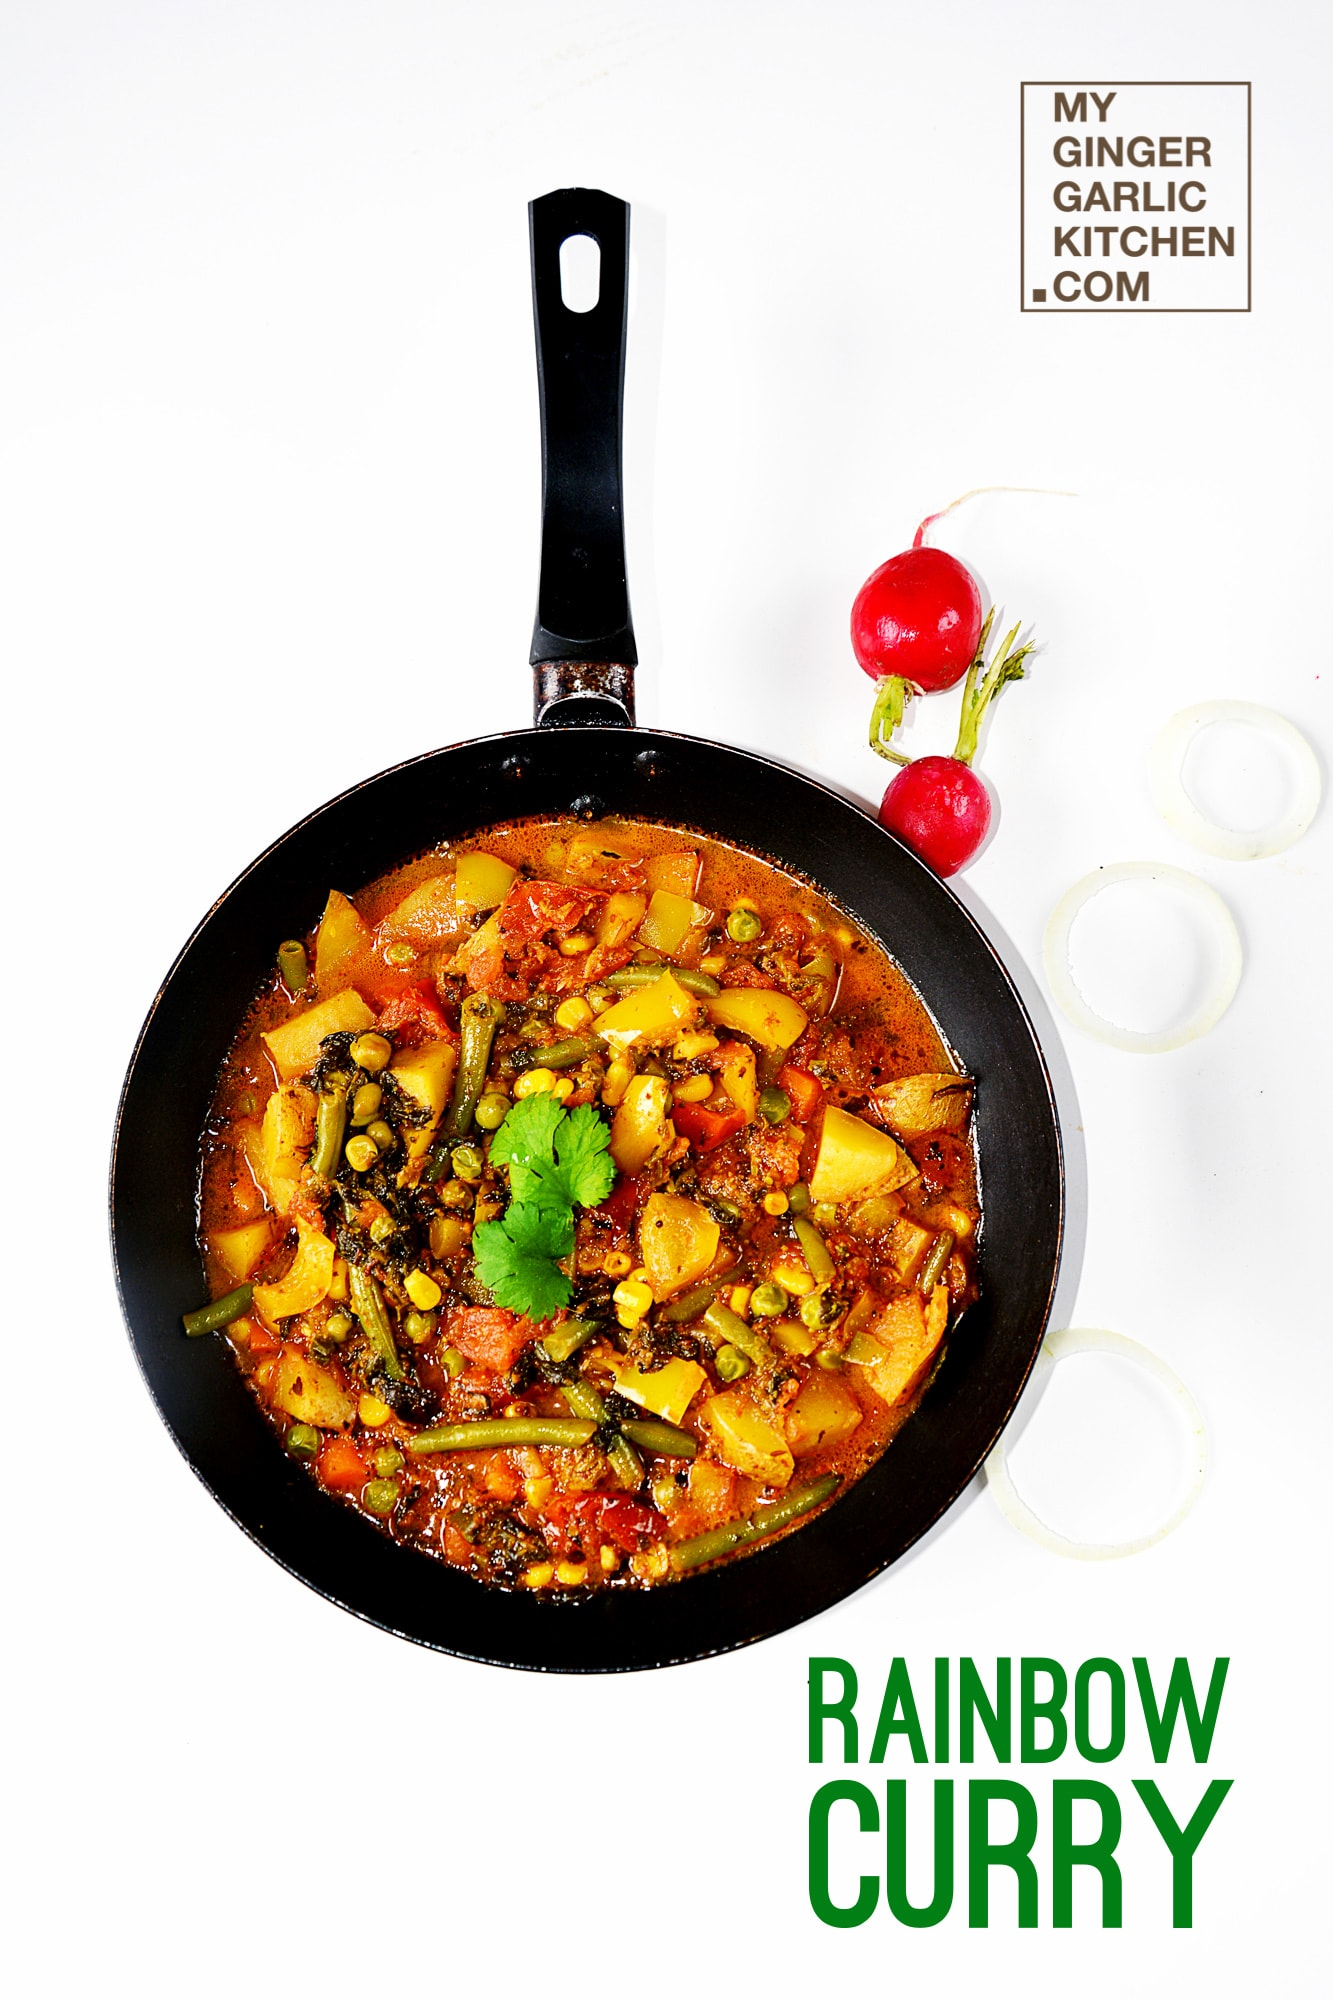 Image - recipe pressure cooker rainbow curry anupama paliwal my ginger garlic kitchen 1